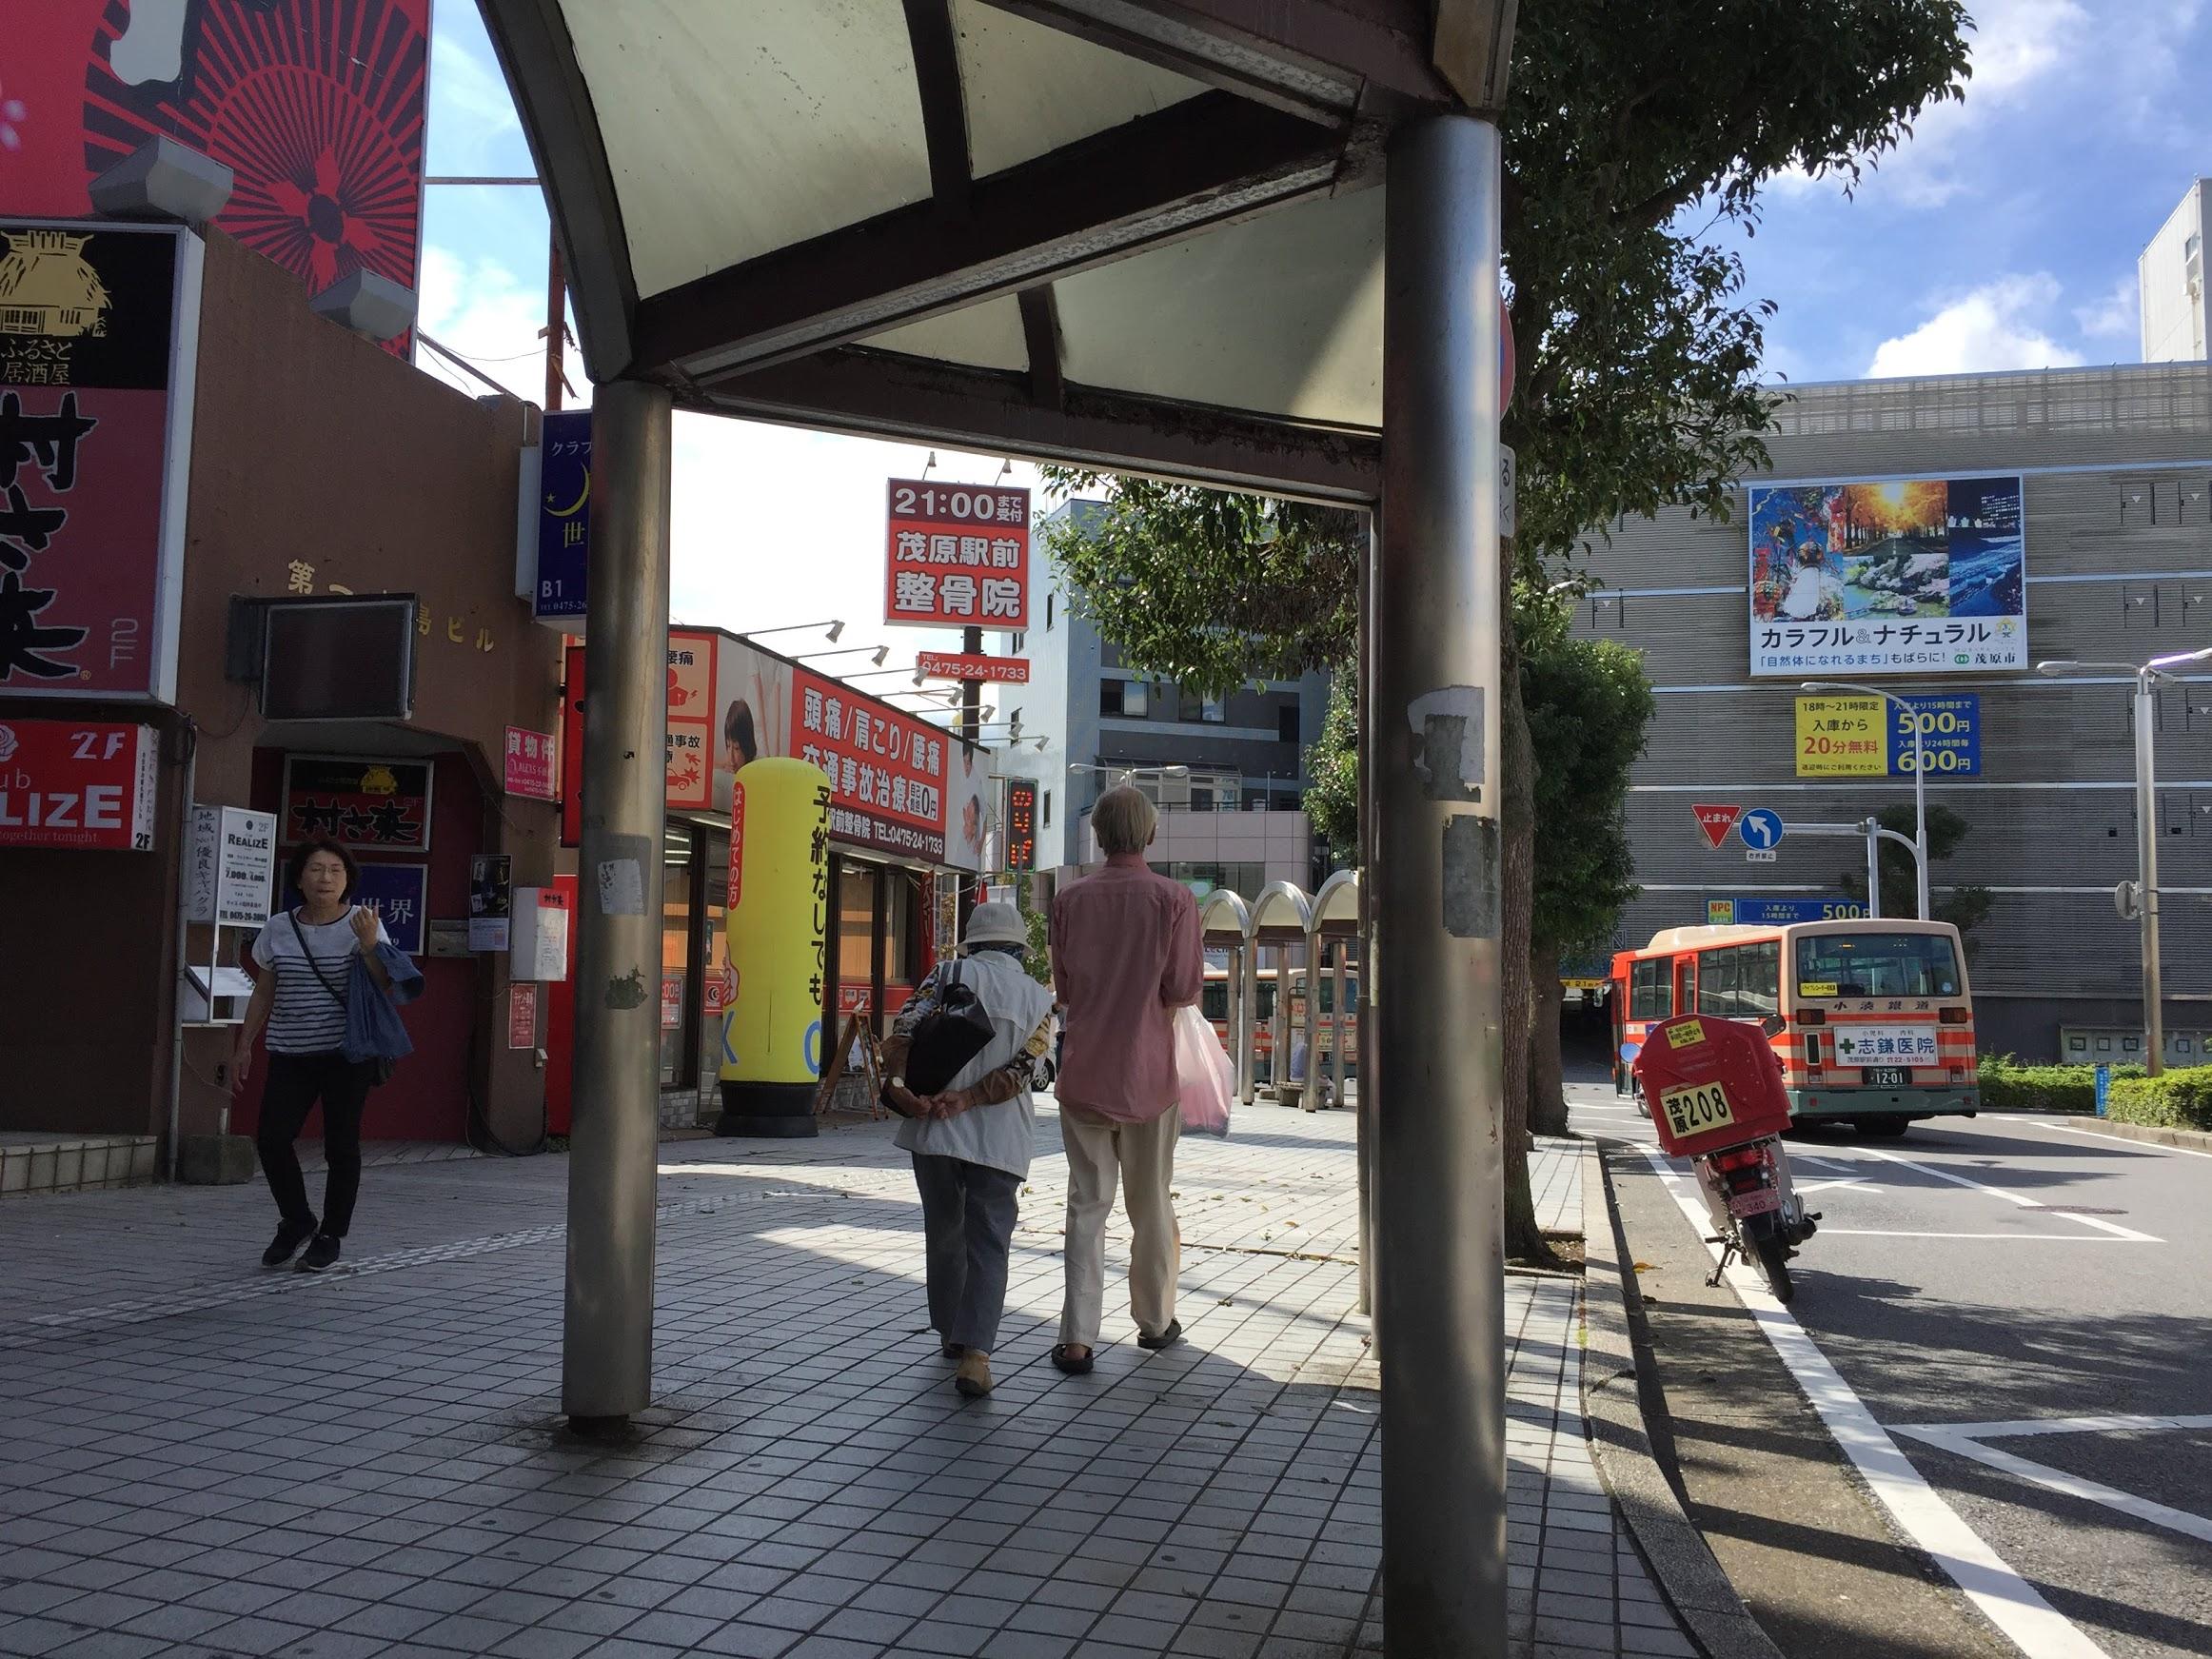 Nach Chiba zum Retreat | story.one